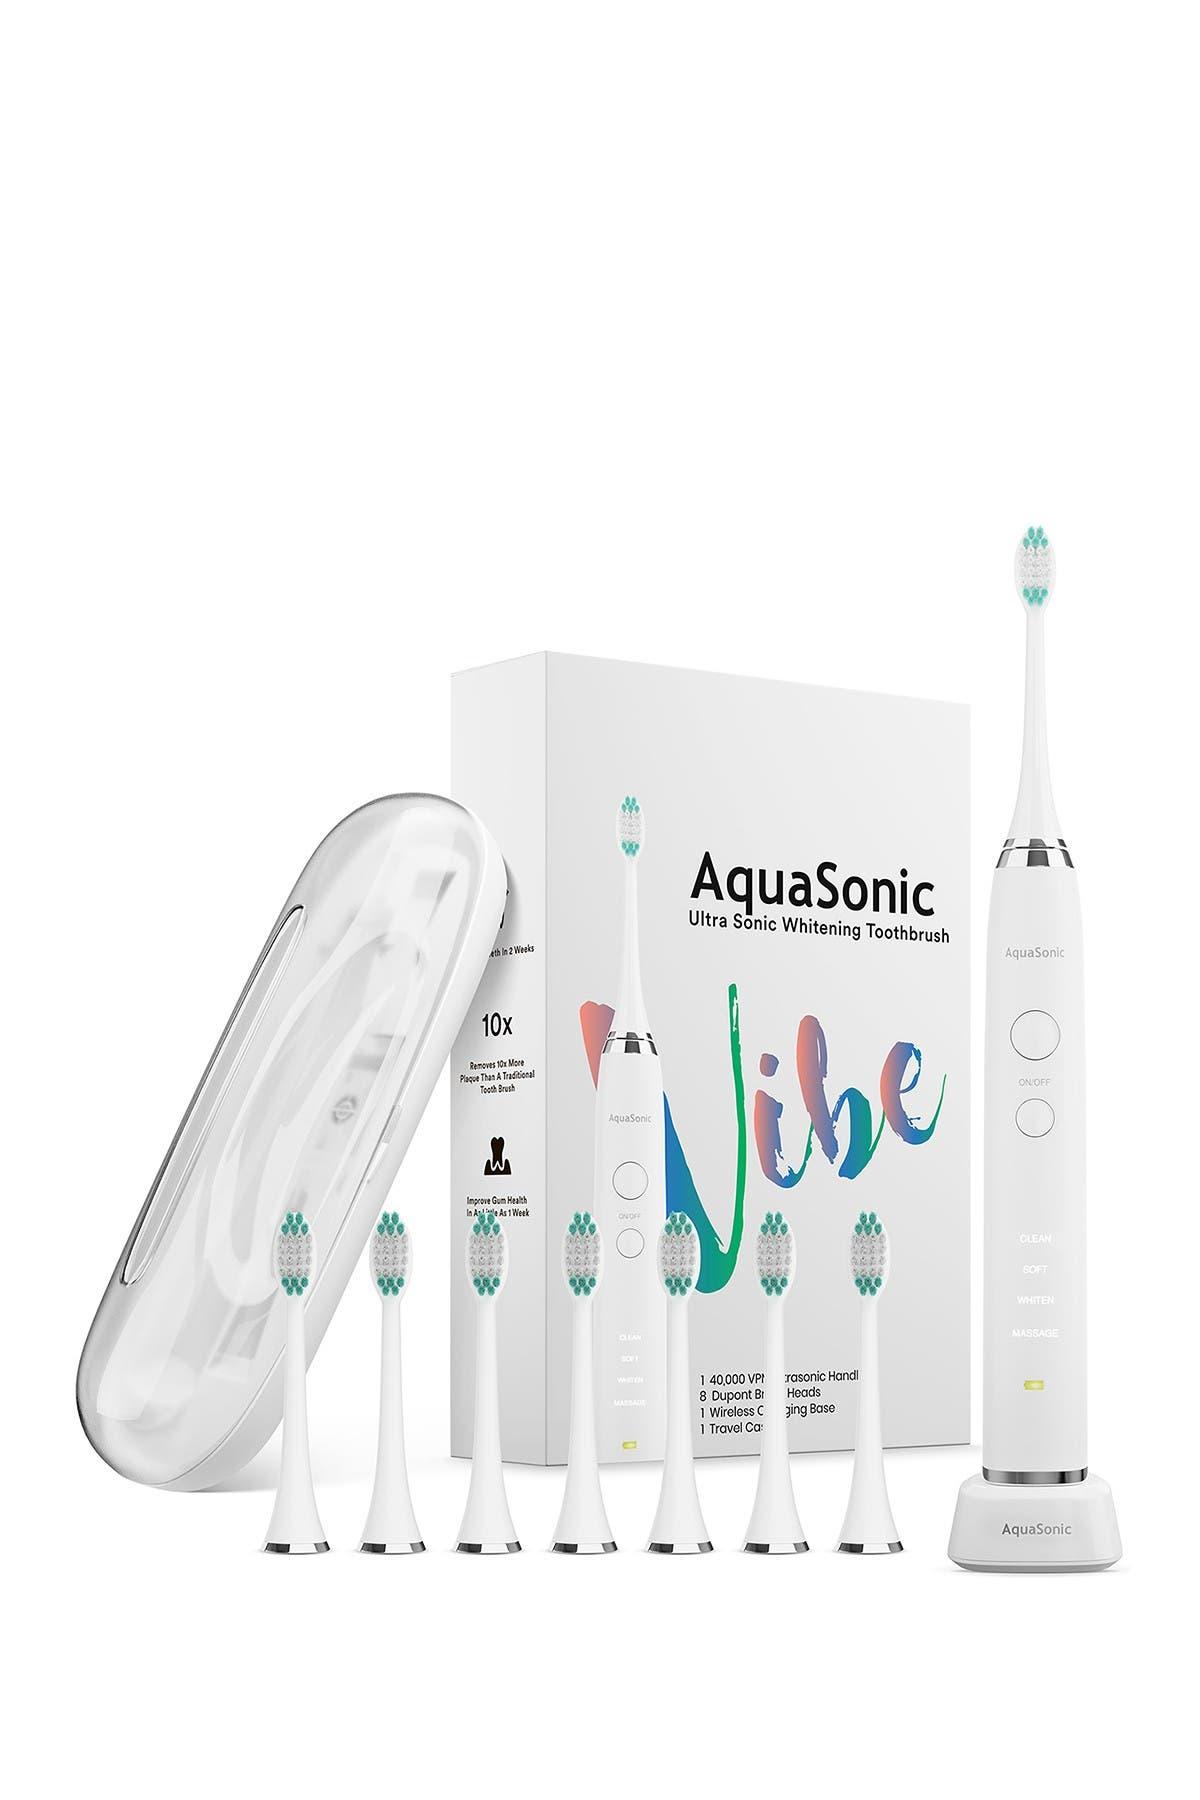 Aquasonic Vibe Series White Ultrasonic Whitening Toothbrush With 8 Dupont Brush Heads & Travel Case In Optic W In Optic White